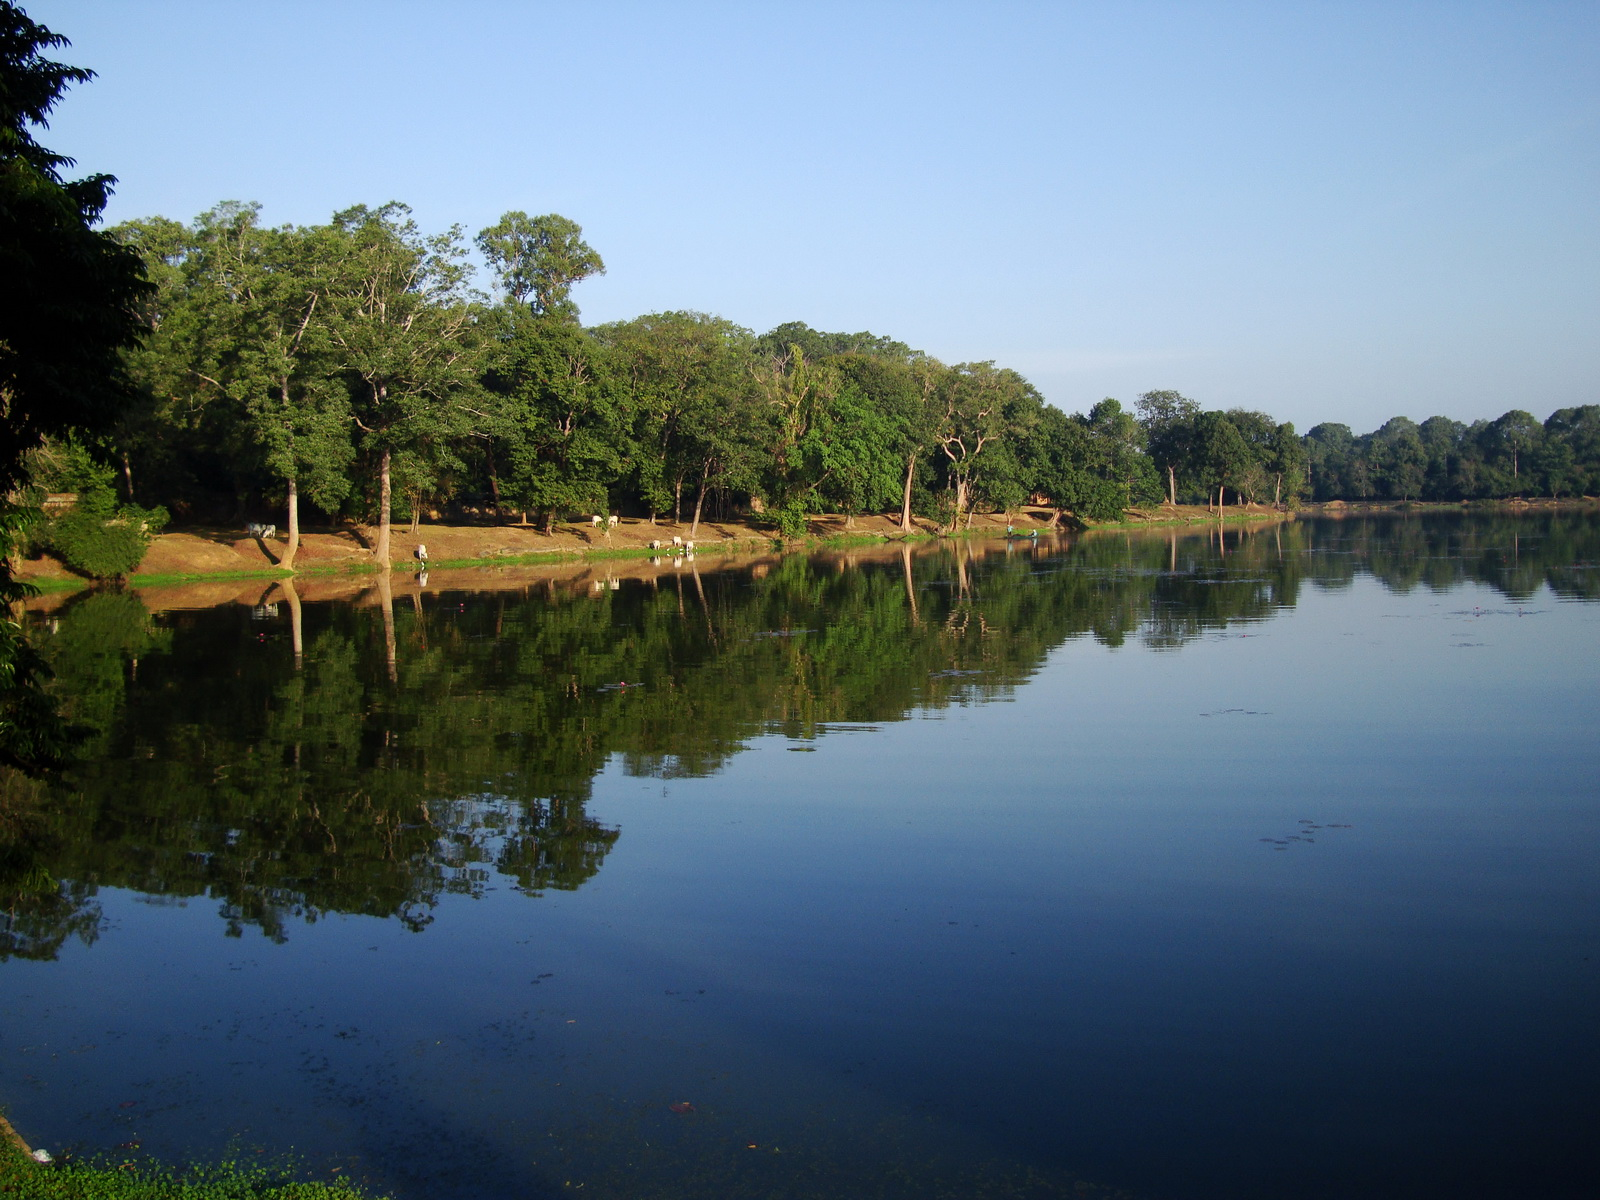 Angkor Wat approaches outer eastern Gopura moat Angkor Siem Reap 01